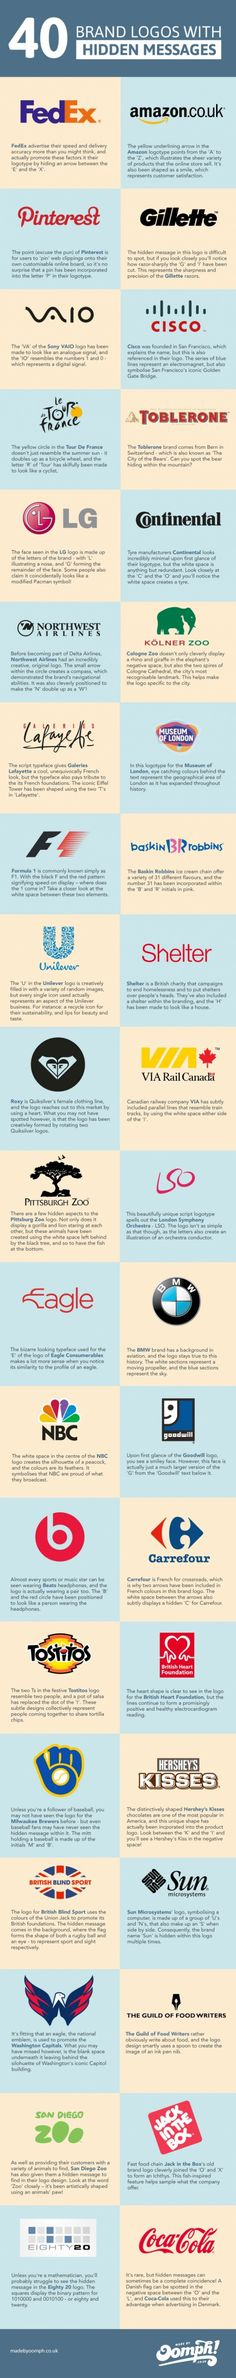 Hidden Symbolism in Logo Design: 40 Creative Examples